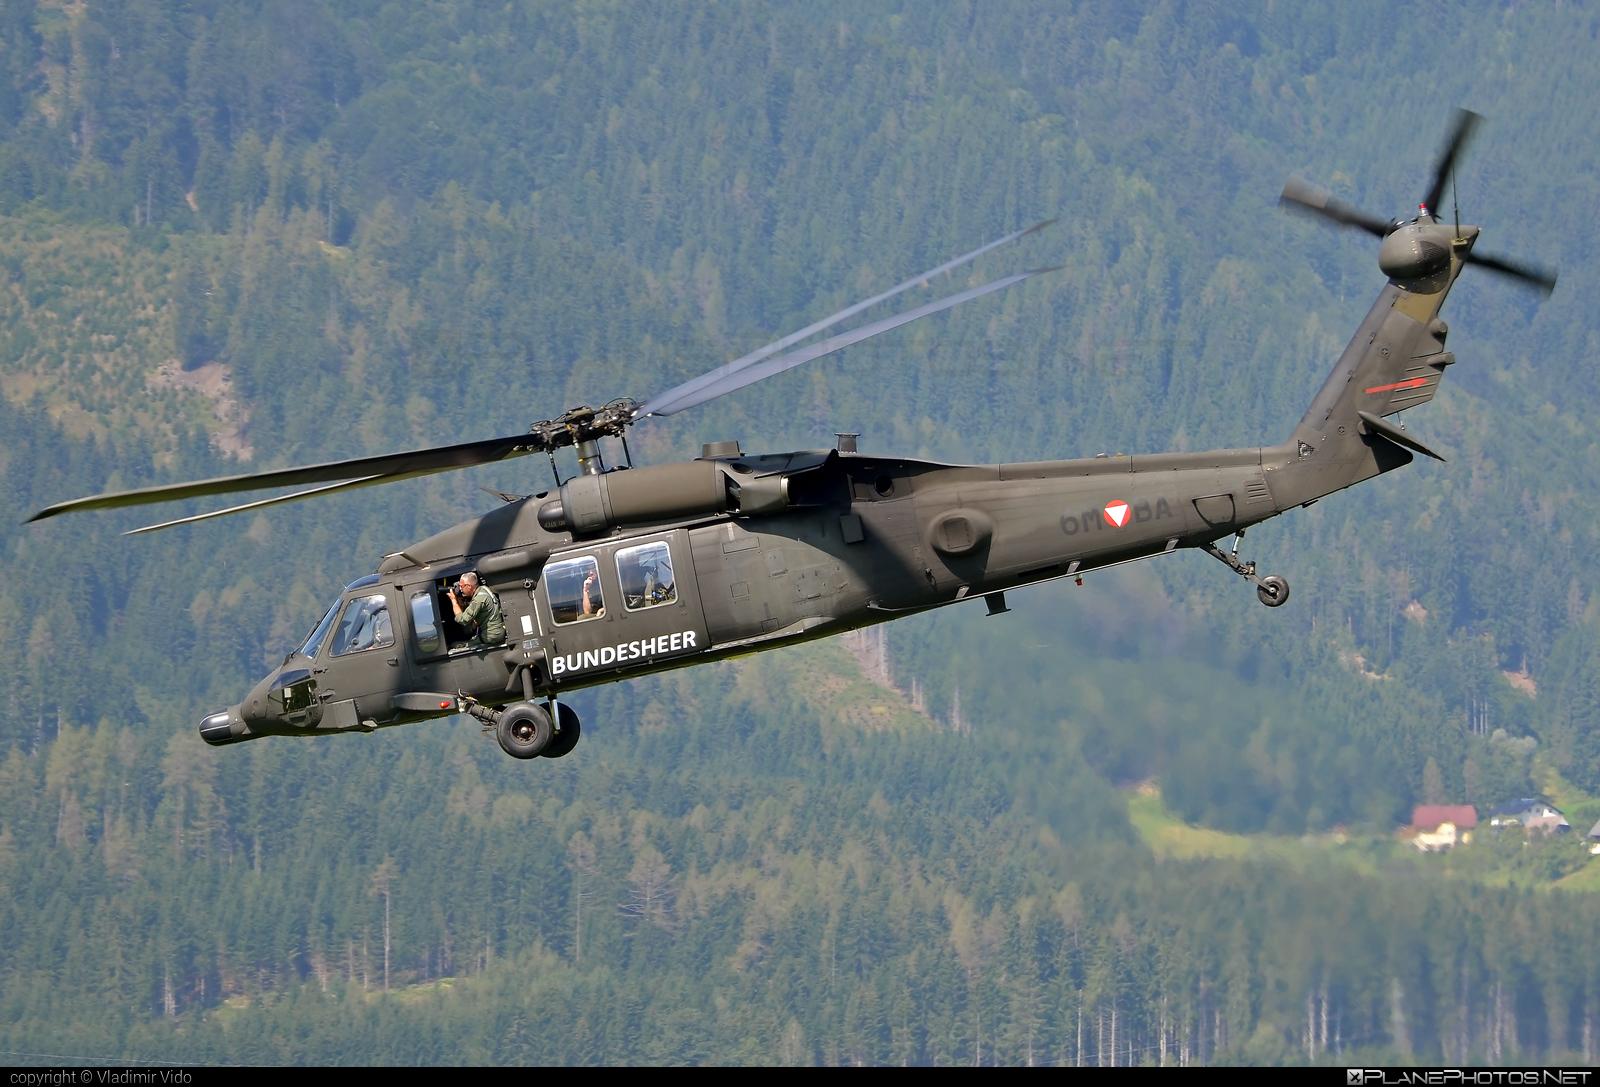 Sikorsky S-70A-42 Black Hawk - 6M-BA operated by Österreichische Luftstreitkräfte (Austrian Air Force) #austrianairforce #blackhawk #s70 #s70a42 #s70a42blackhawk #sikorsky #sikorskys70